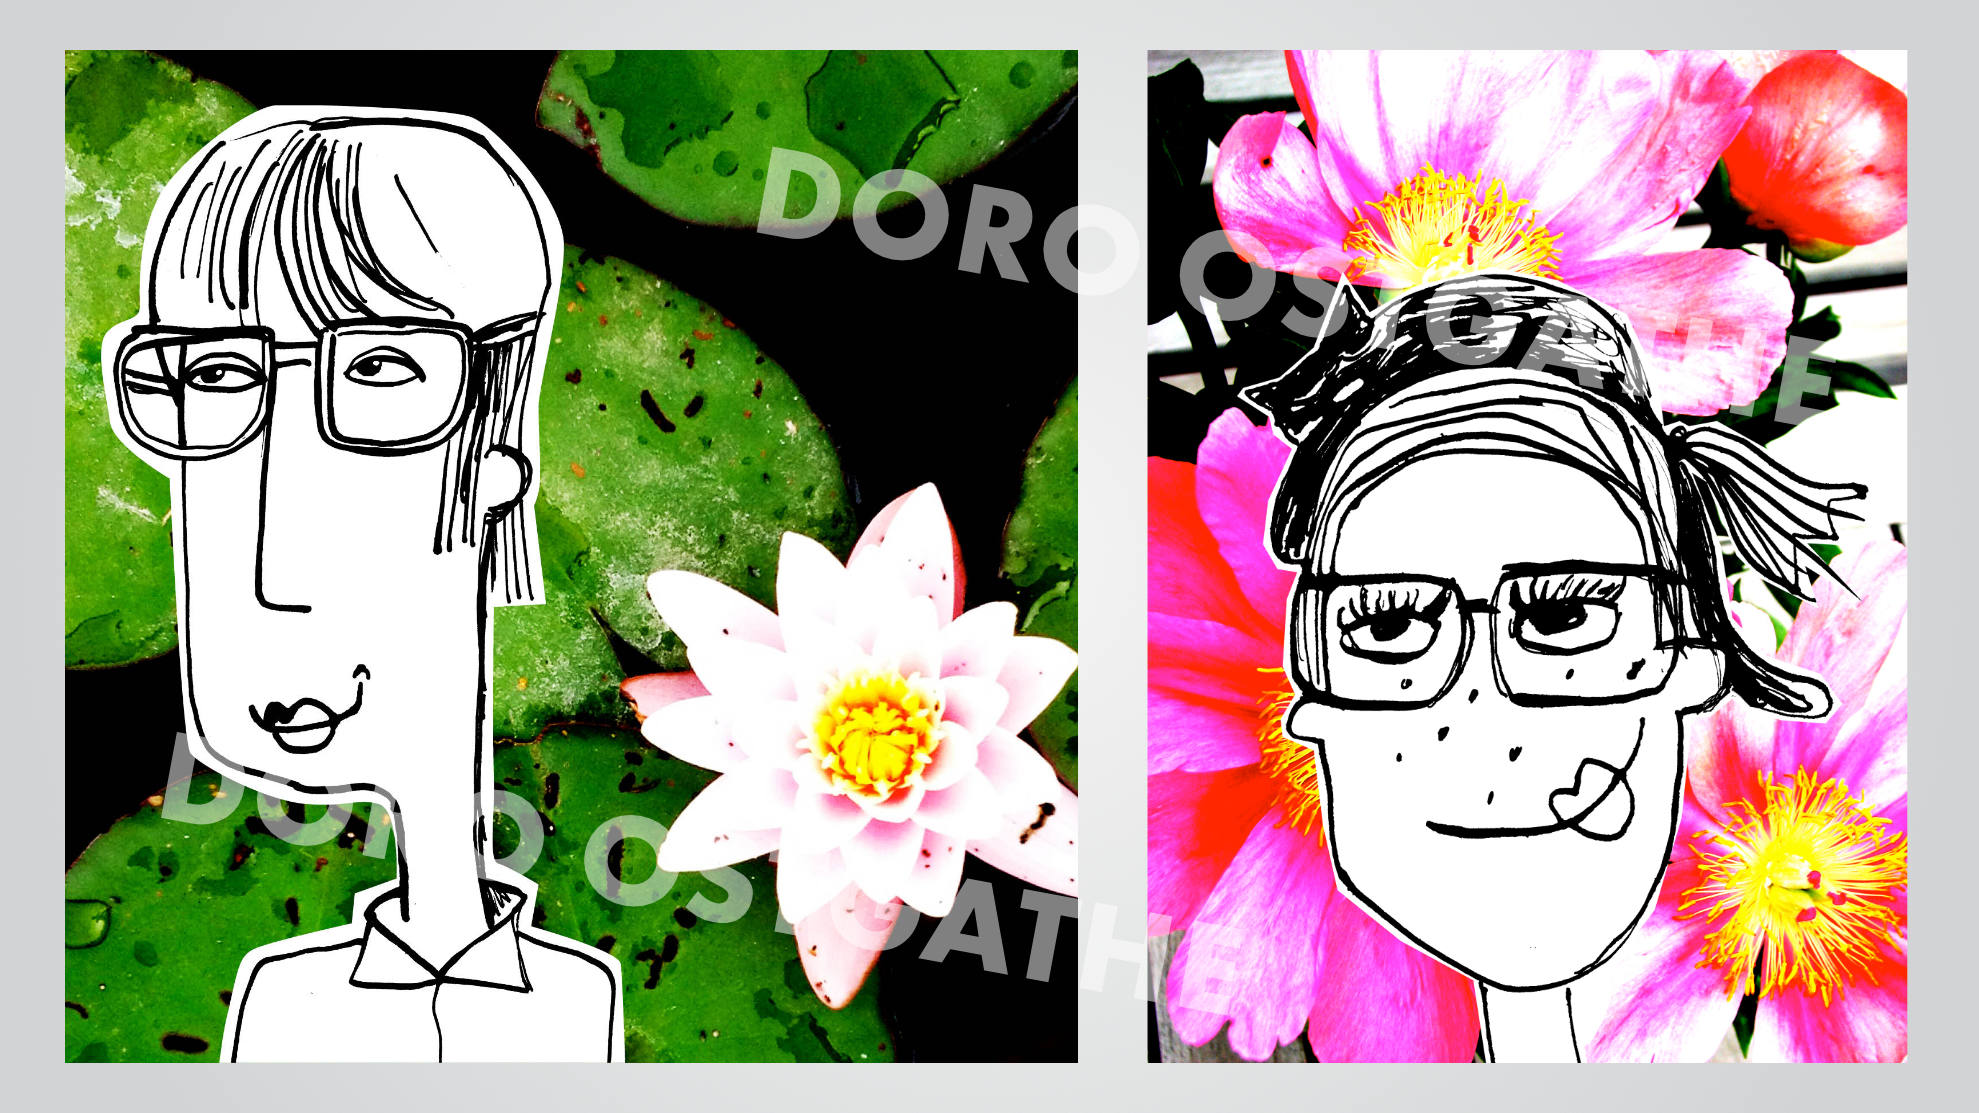 illustration-kunst-art-ostgathe-03.jpg